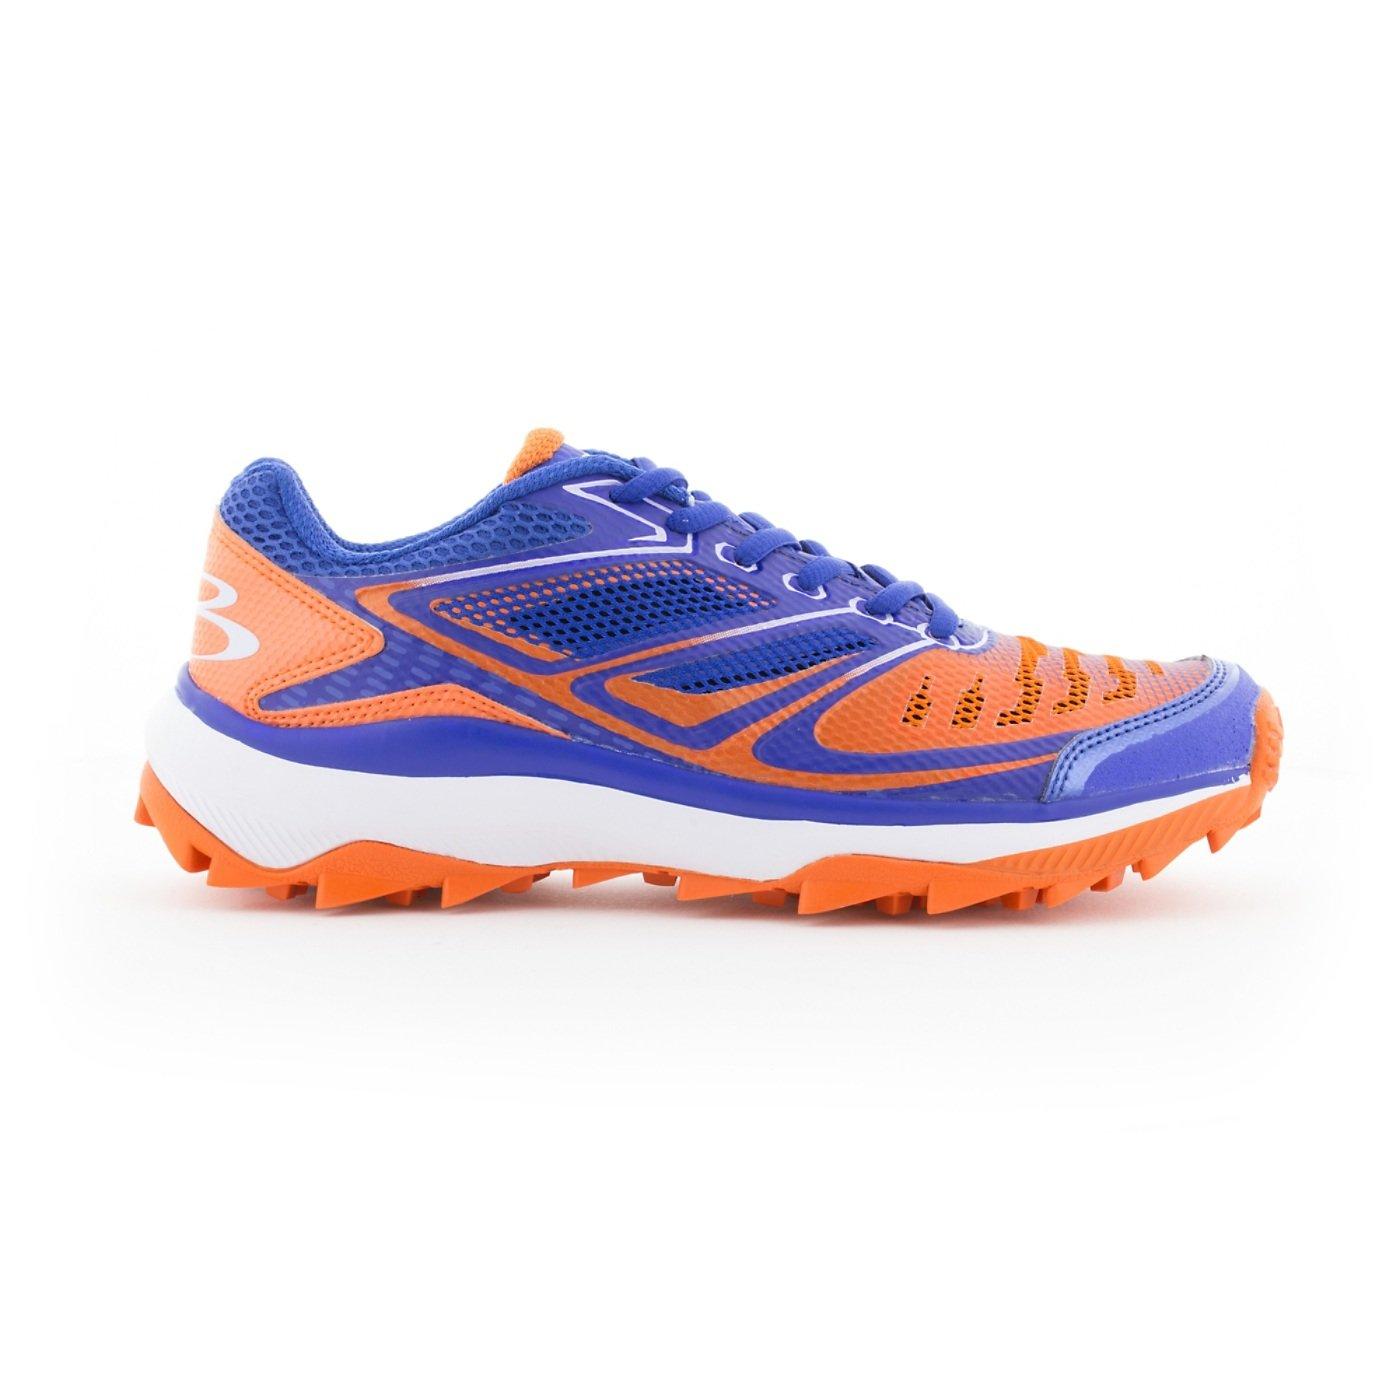 BoombahメンズTurbine Turf Shoes – 20カラーオプション – 複数のサイズ B076JRJHPX 13|ロイヤル/オレンジ ロイヤル/オレンジ 13